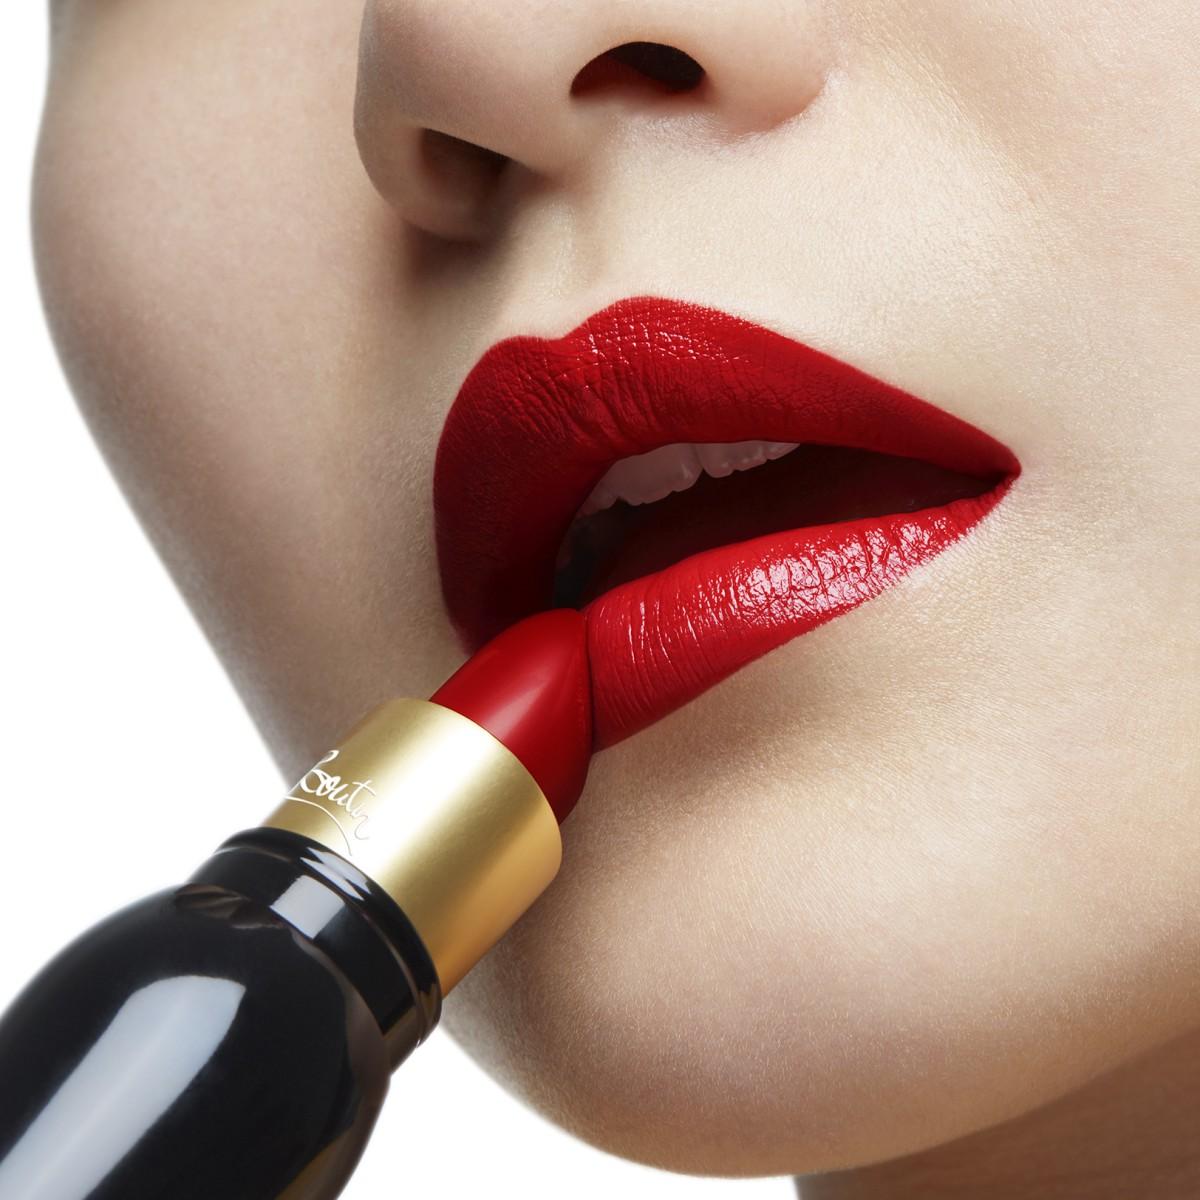 Woman Beauty - Rouge Louboutin - Christian Louboutin